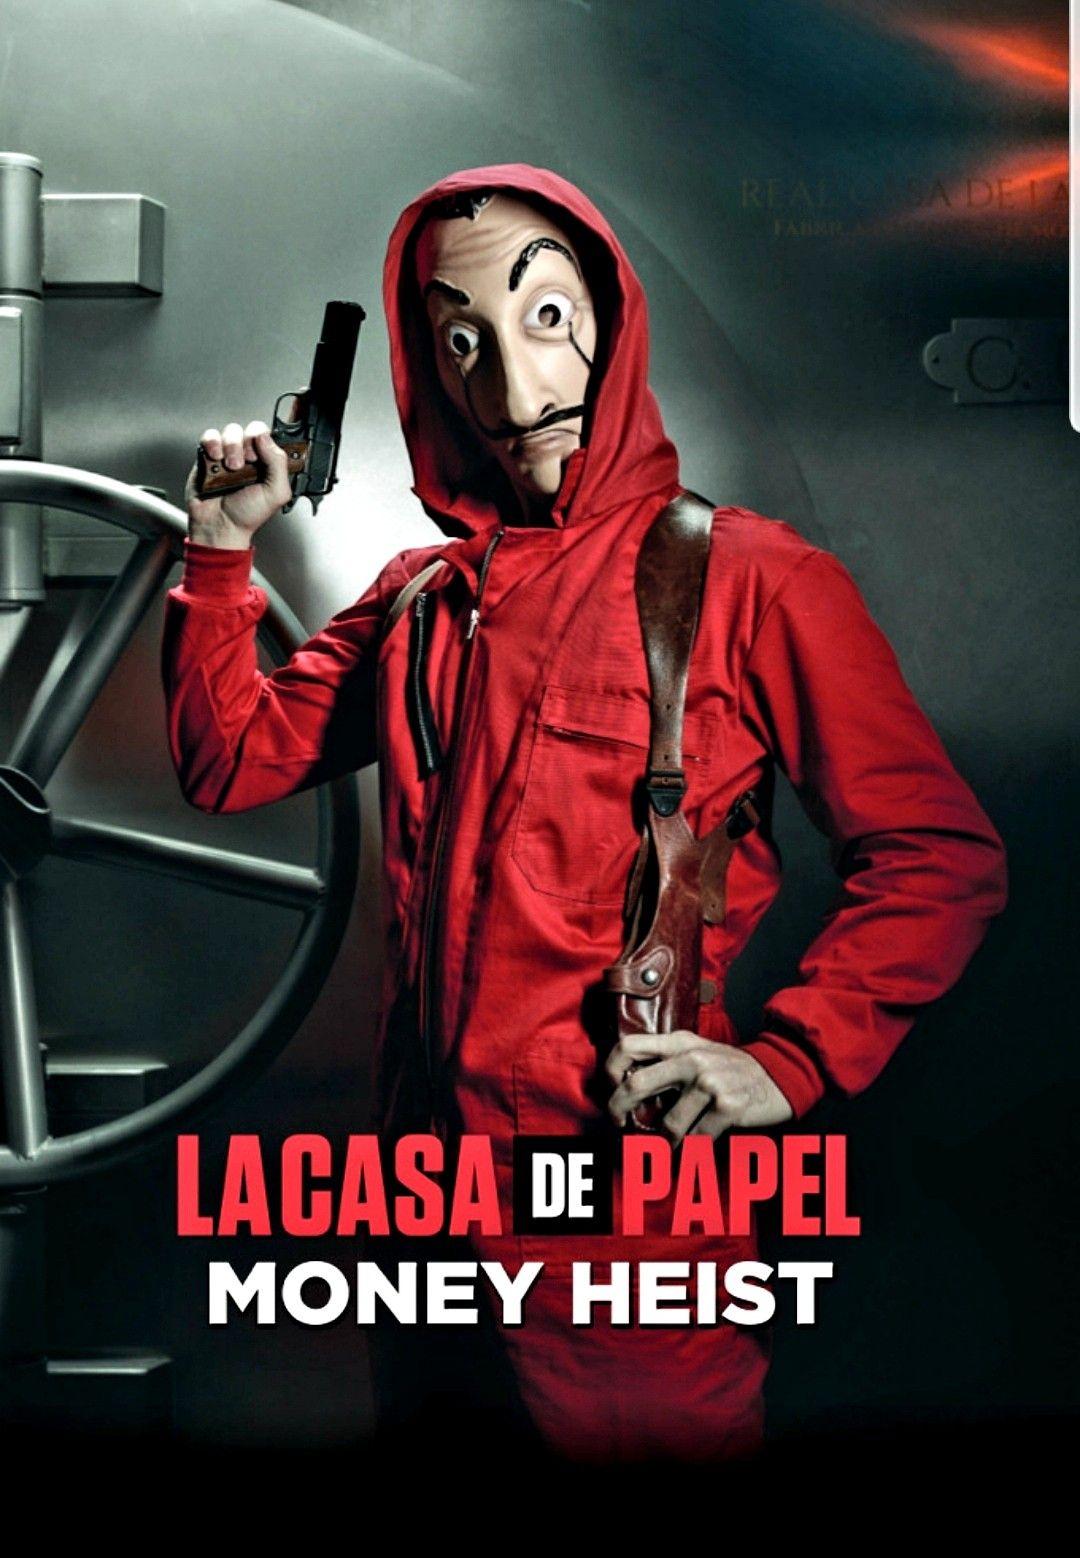 62 Money Heist Tv Series To Watch